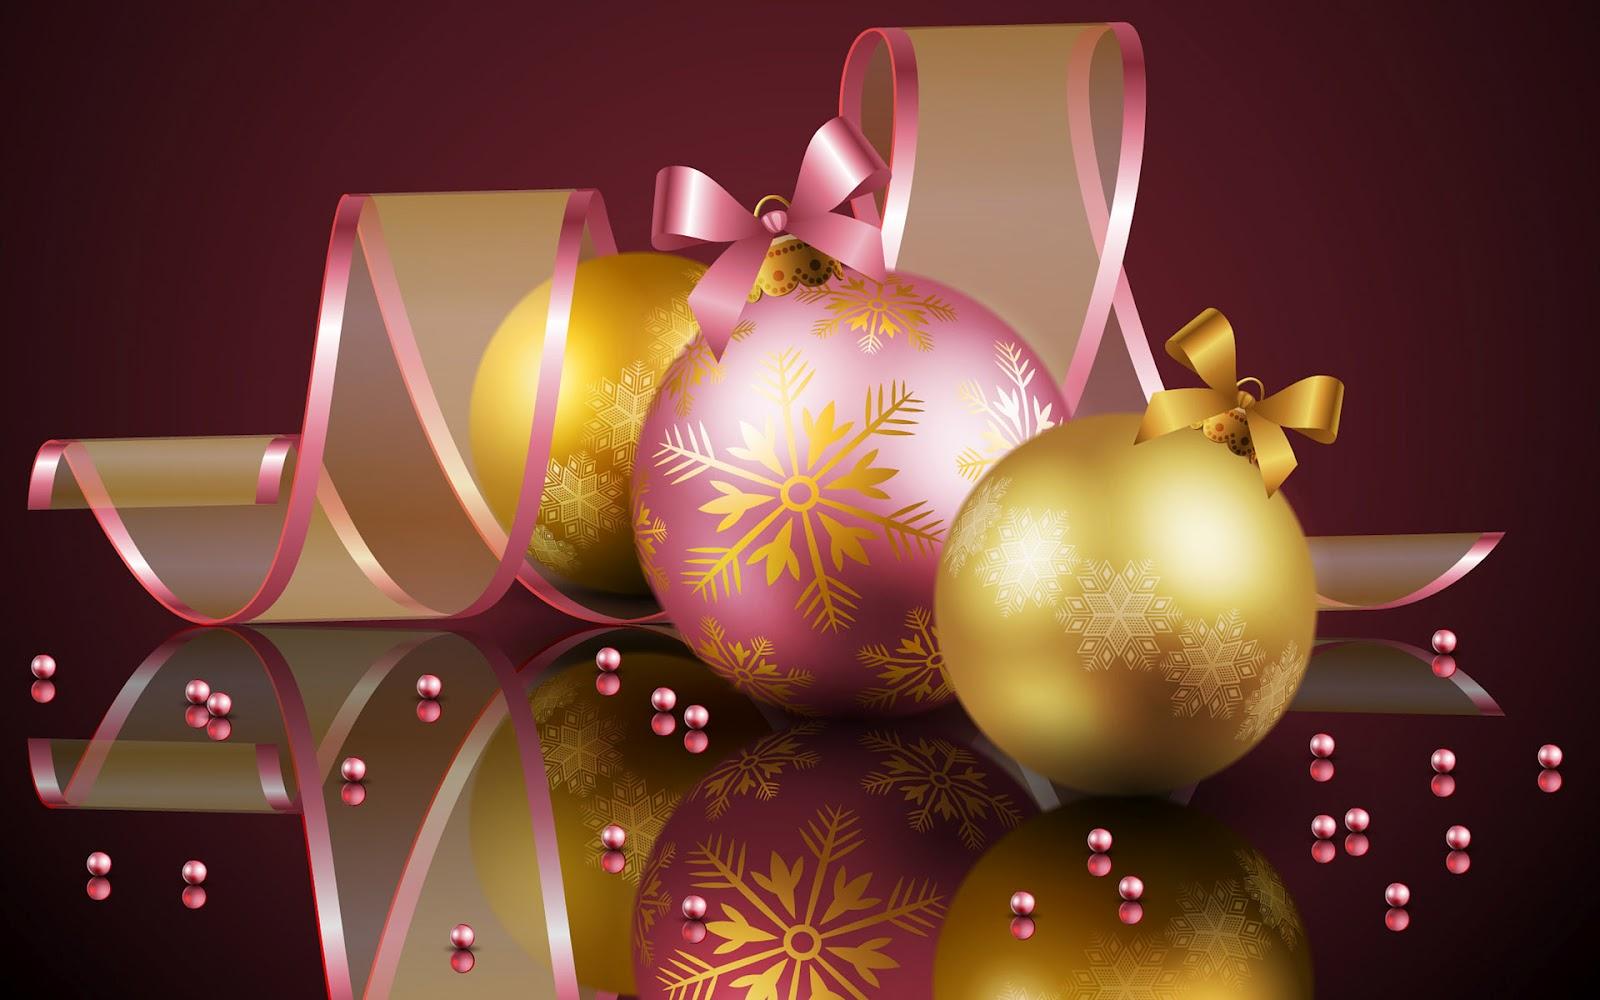 http://3.bp.blogspot.com/-pZLm_m8AFAE/UFYm2mt_G6I/AAAAAAAACKY/dMc4lZZ357I/s1600/hd-kerst-wallpaper-met-een-paar-mooie-kerstballen-achtergrond-foto.jpg